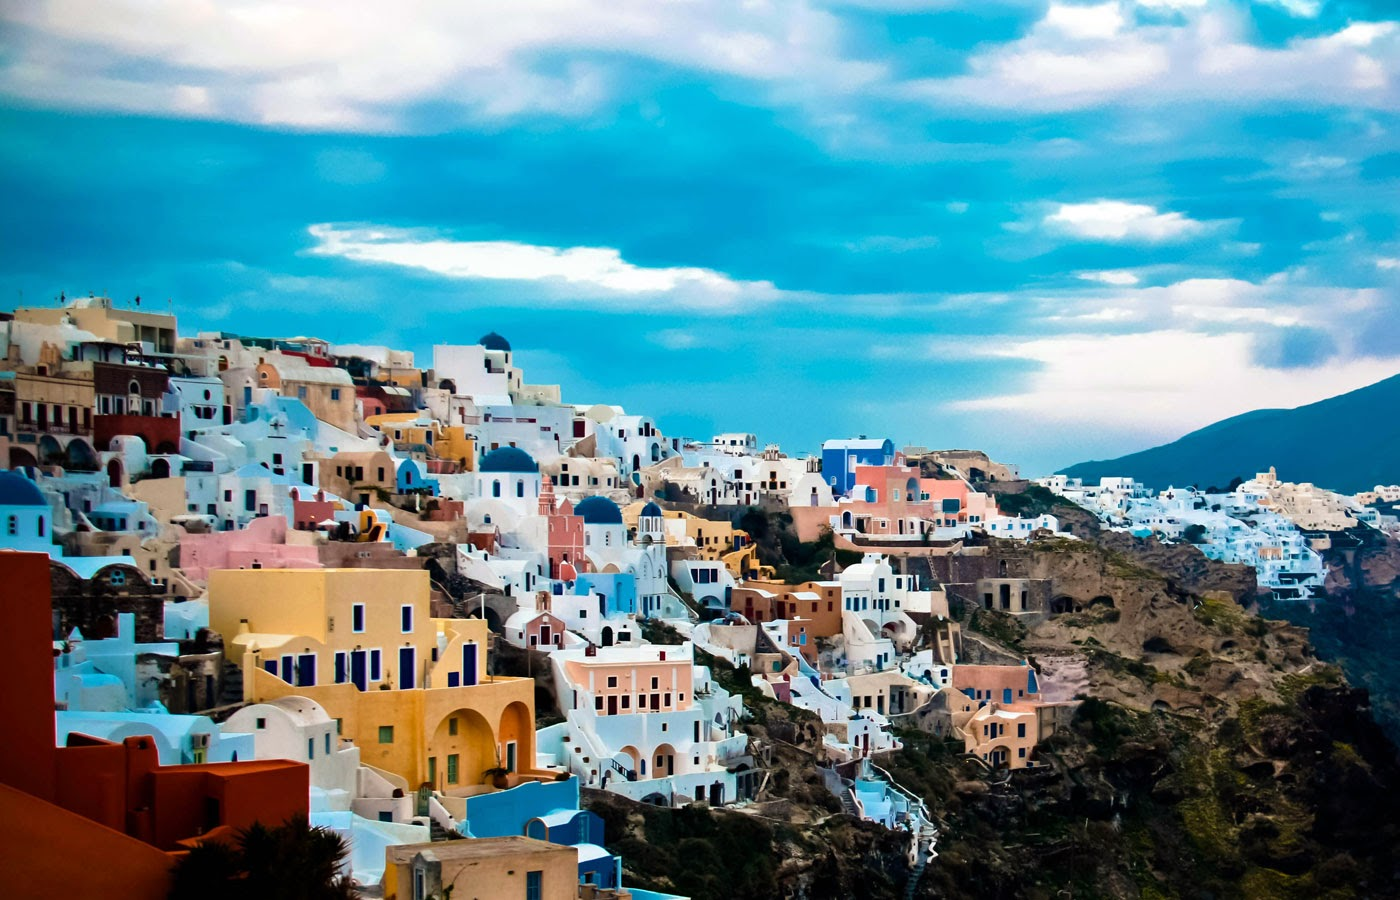 World Visits Tourists Place Santorini Colorful City Of Greece